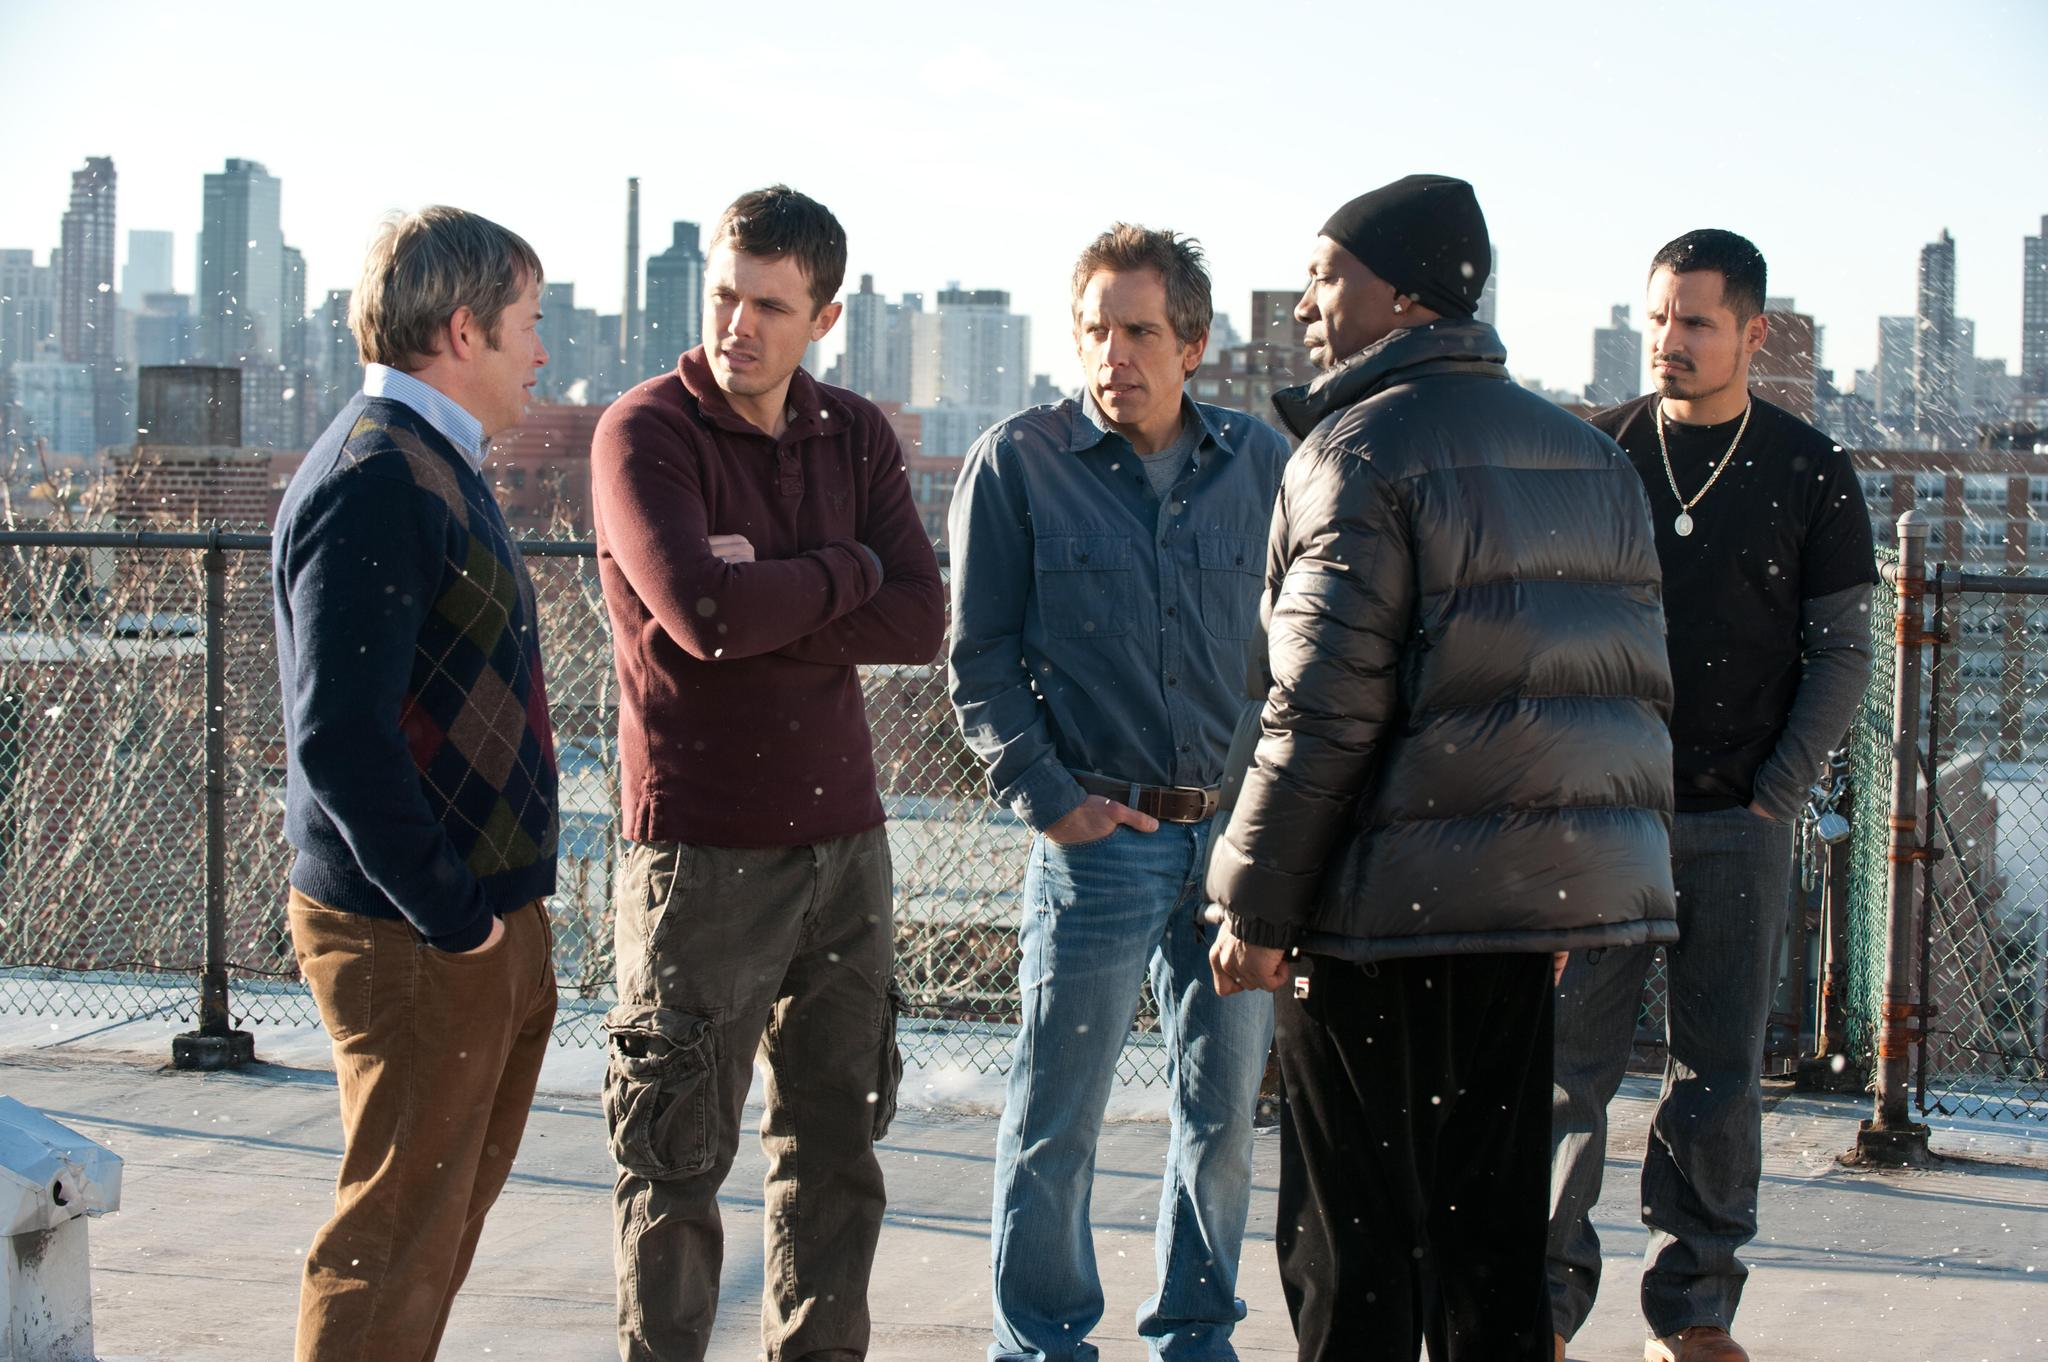 Matthew Broderick, Eddie Murphy, Casey Affleck, Ben Stiller, and Michael Peña in Tower Heist (2011)